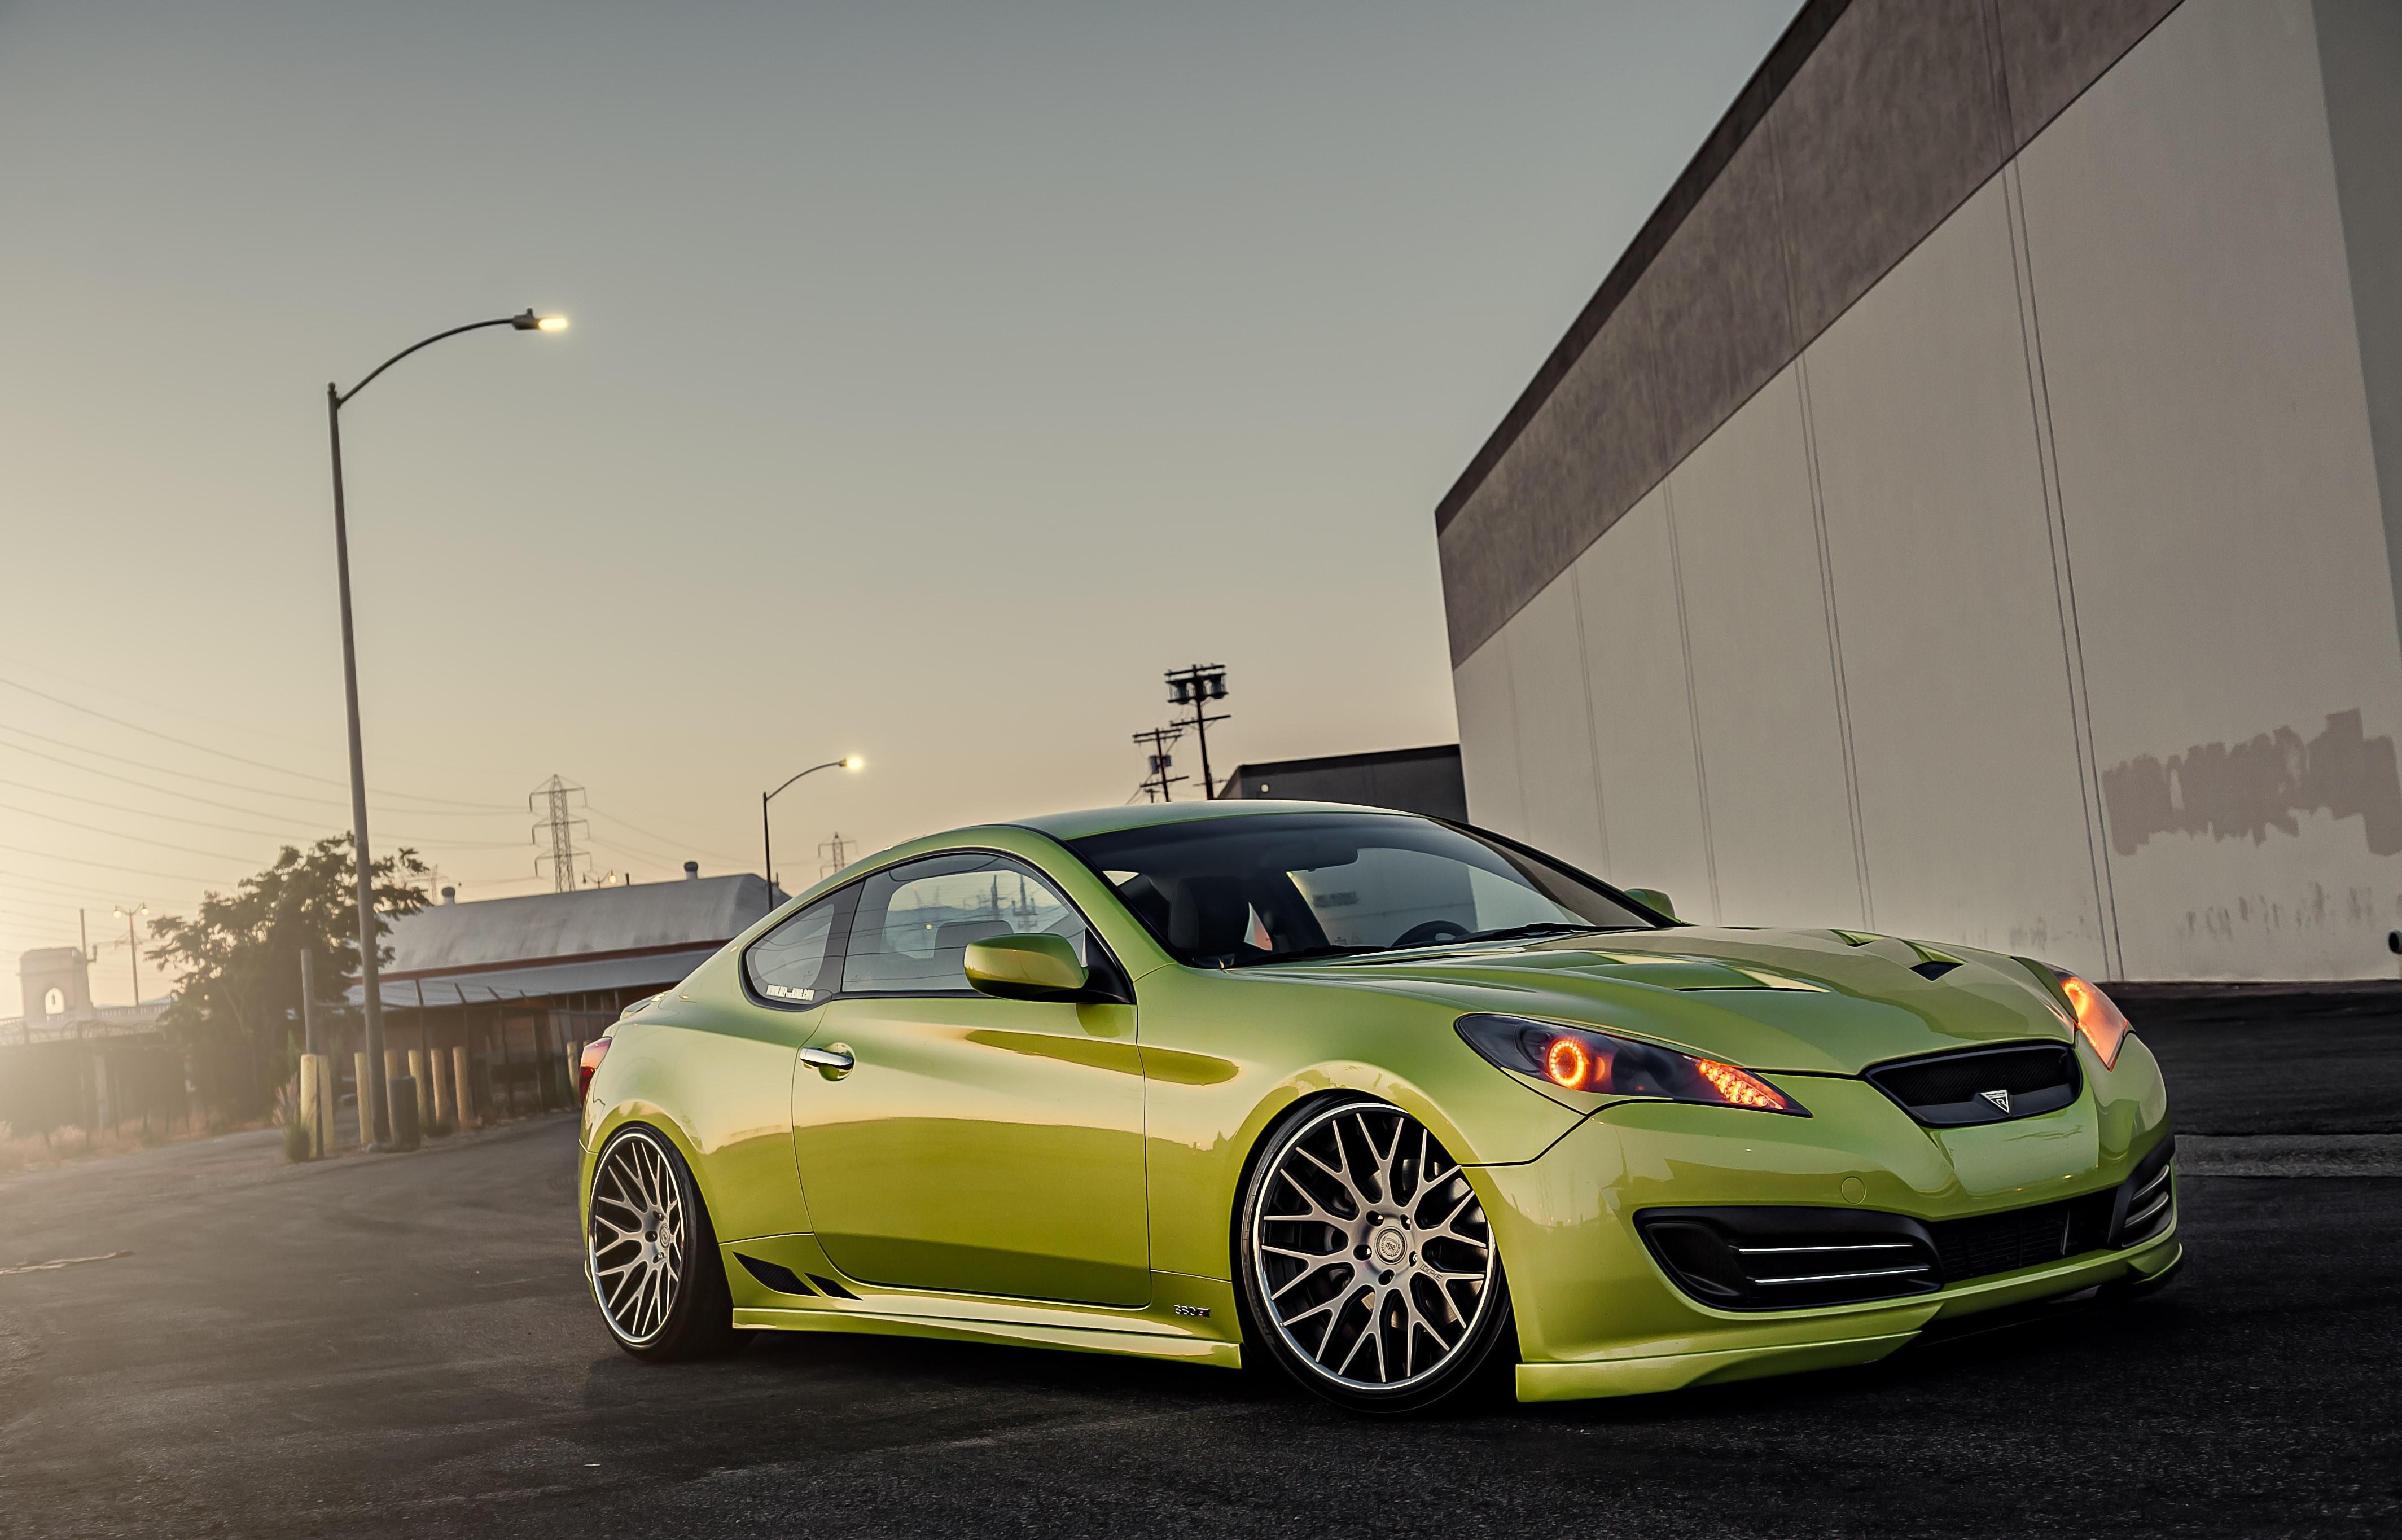 Green Hyundai Stance Genesis, HD Cars, 4k Wallpapers ...